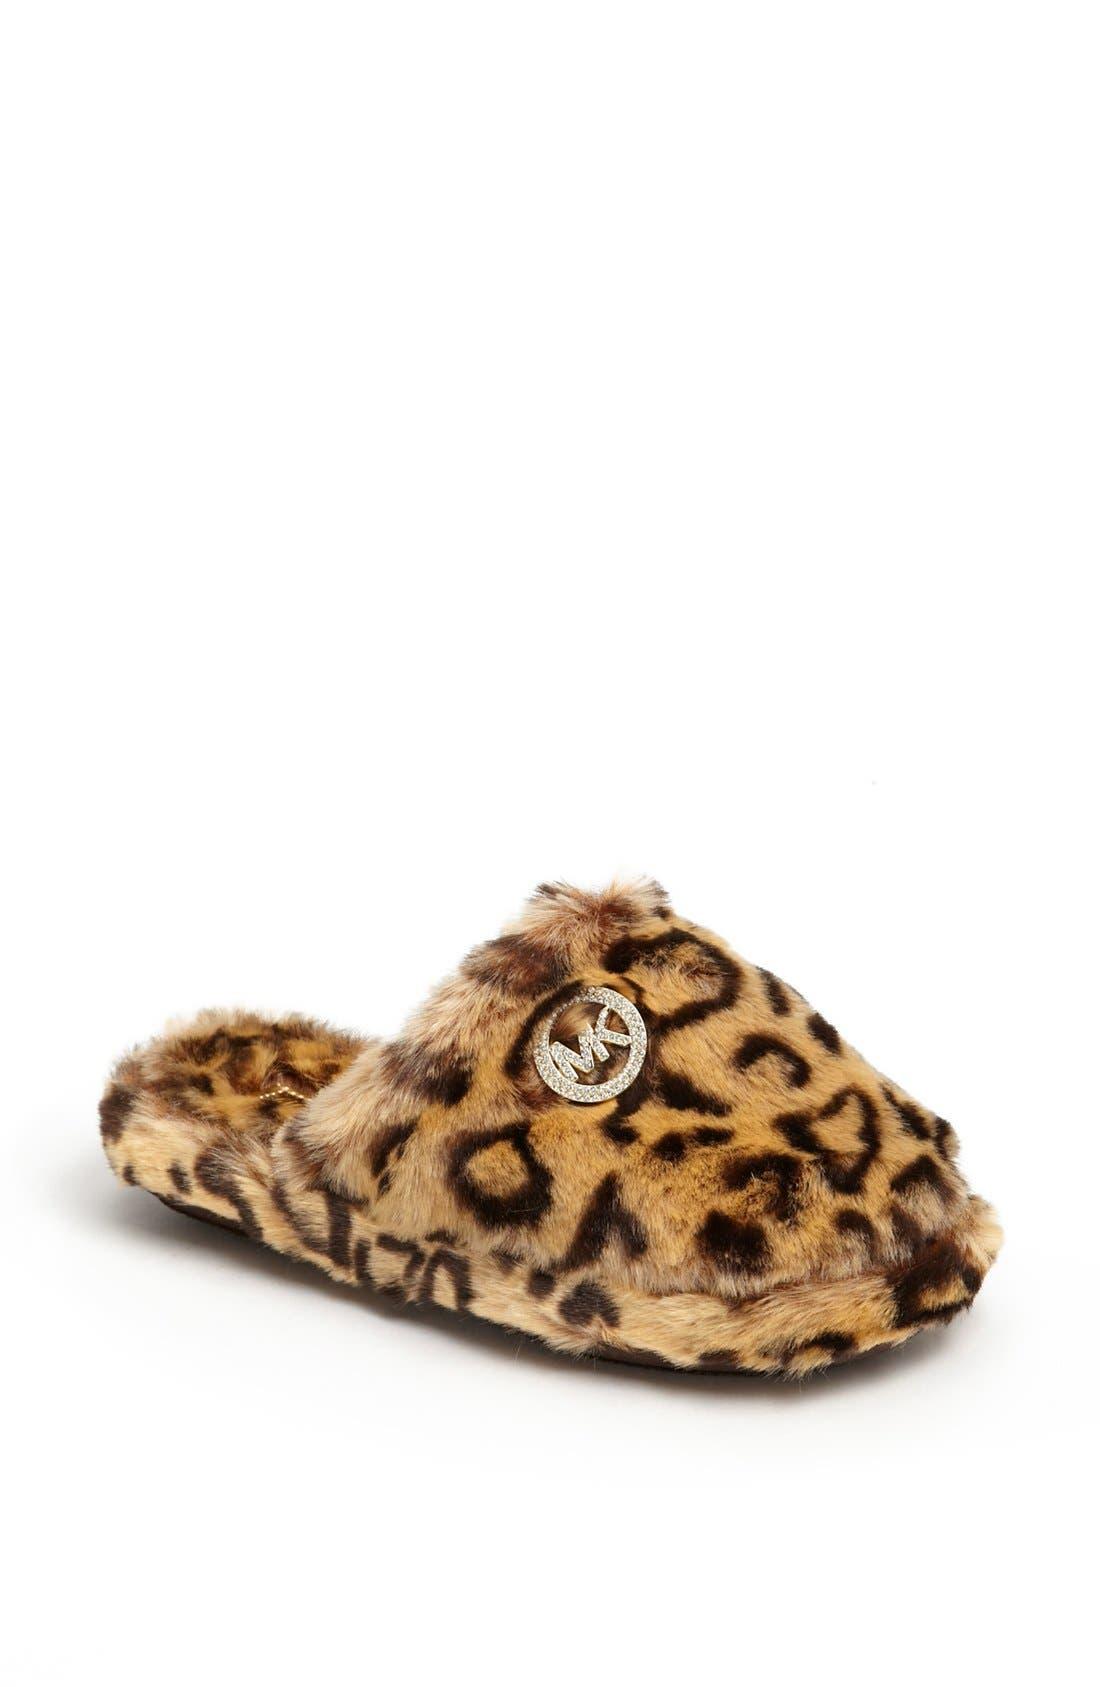 Alternate Image 1 Selected - MICHAEL Michael Kors 'Jet Set' Faux Fur Slipper